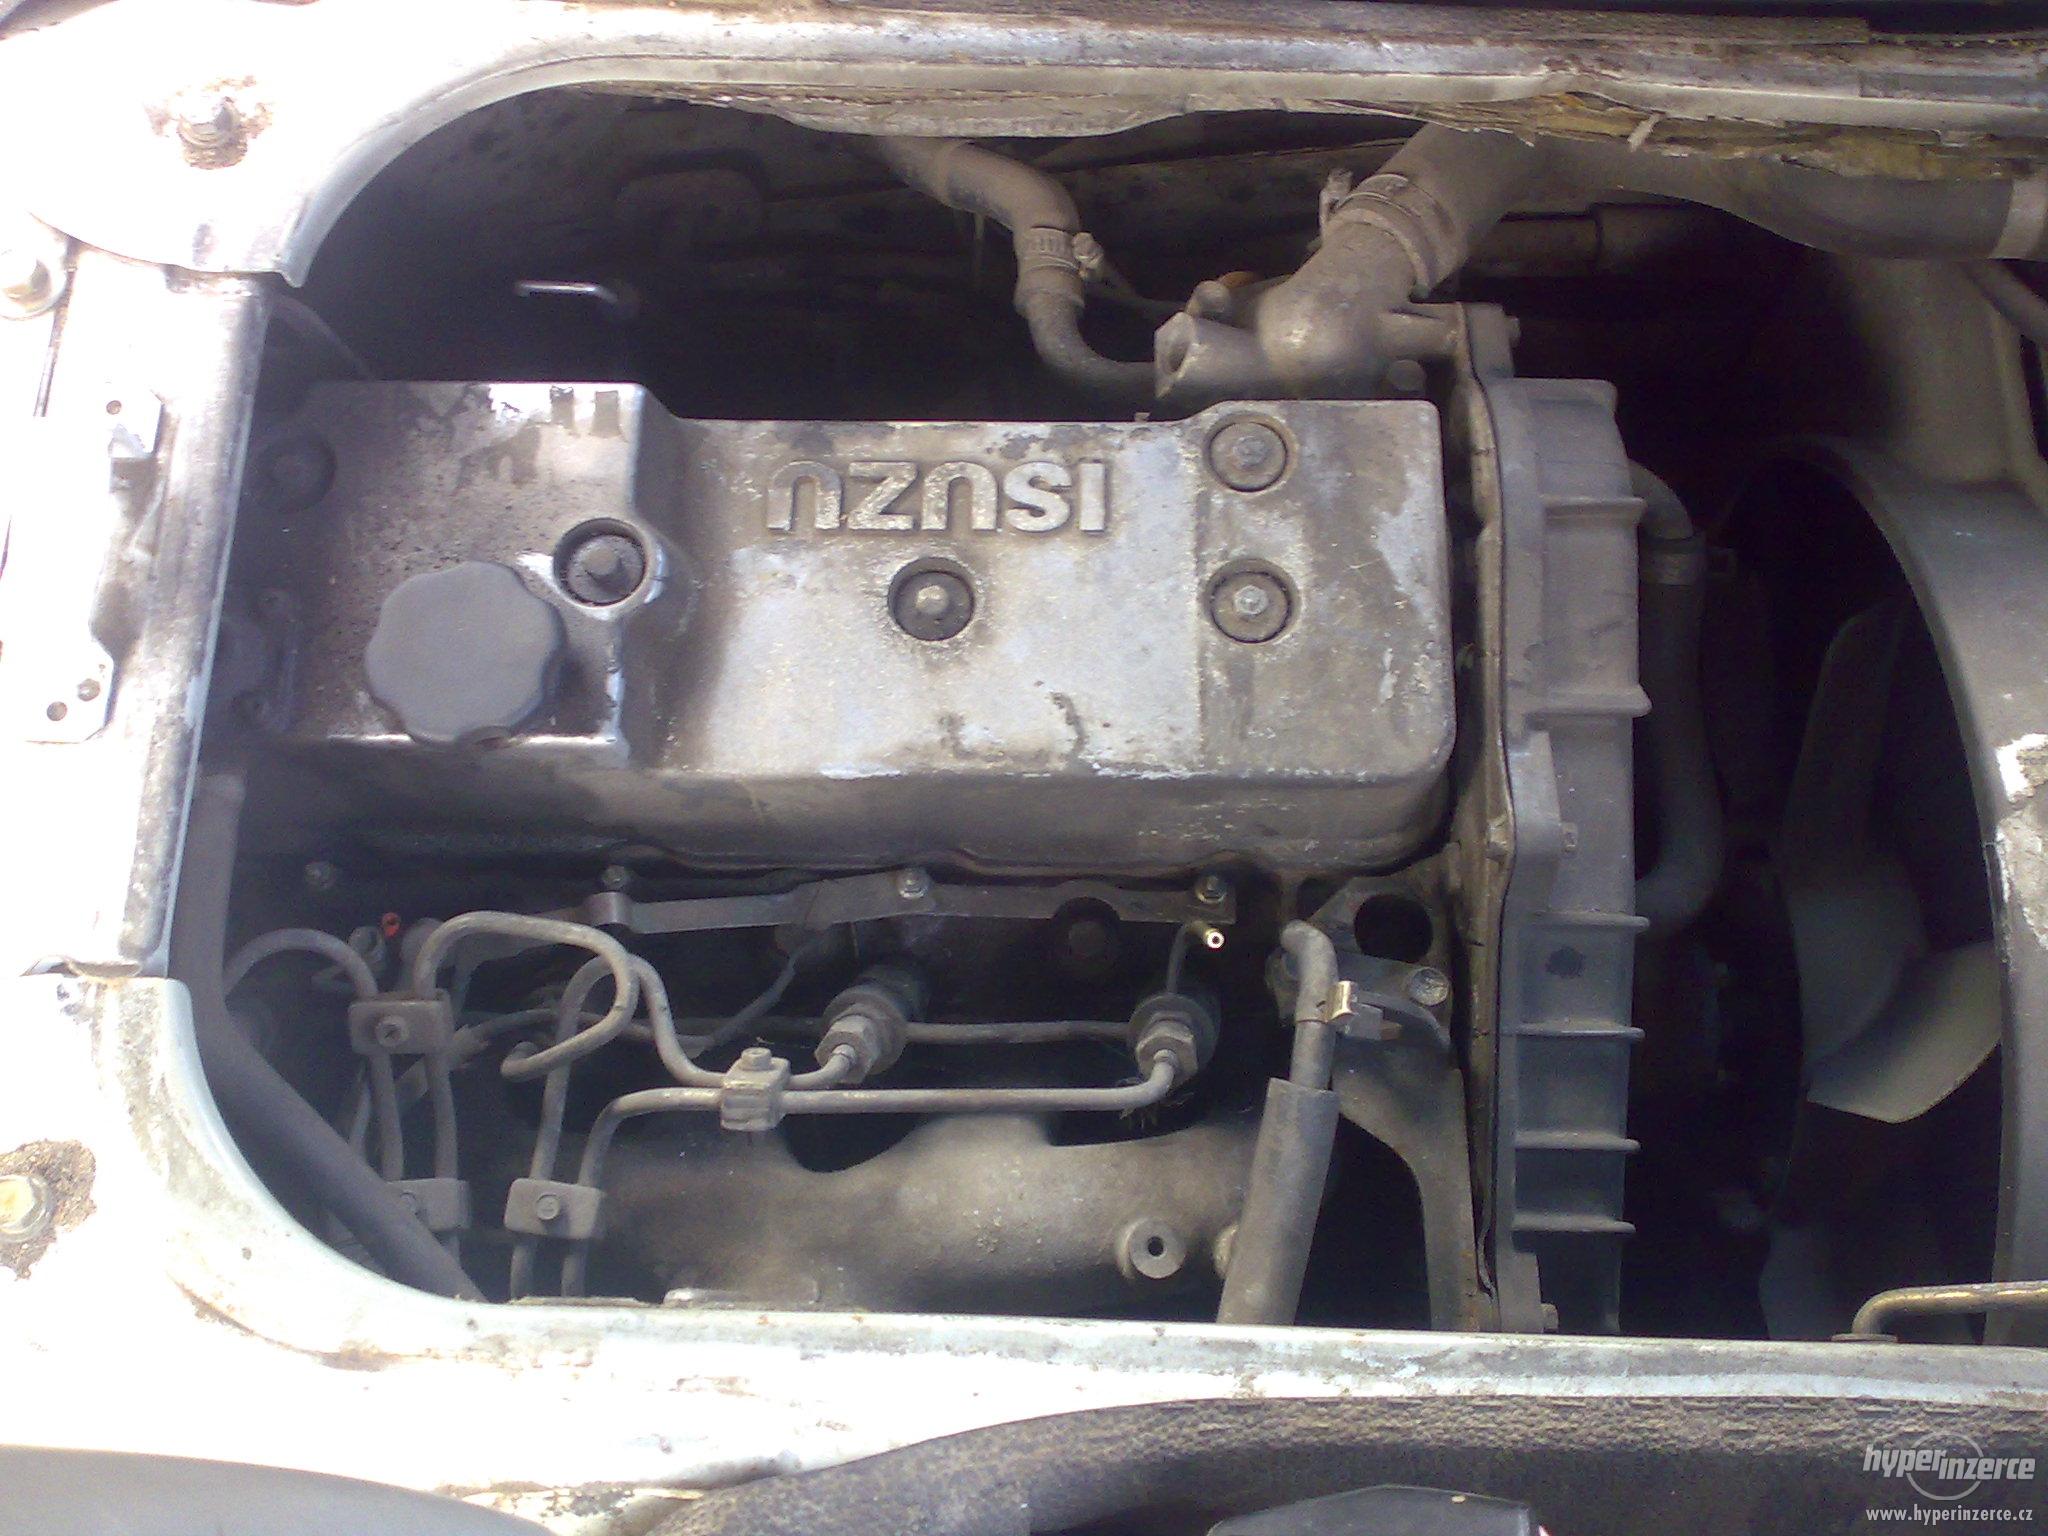 Isuzu Midi 2.2 D